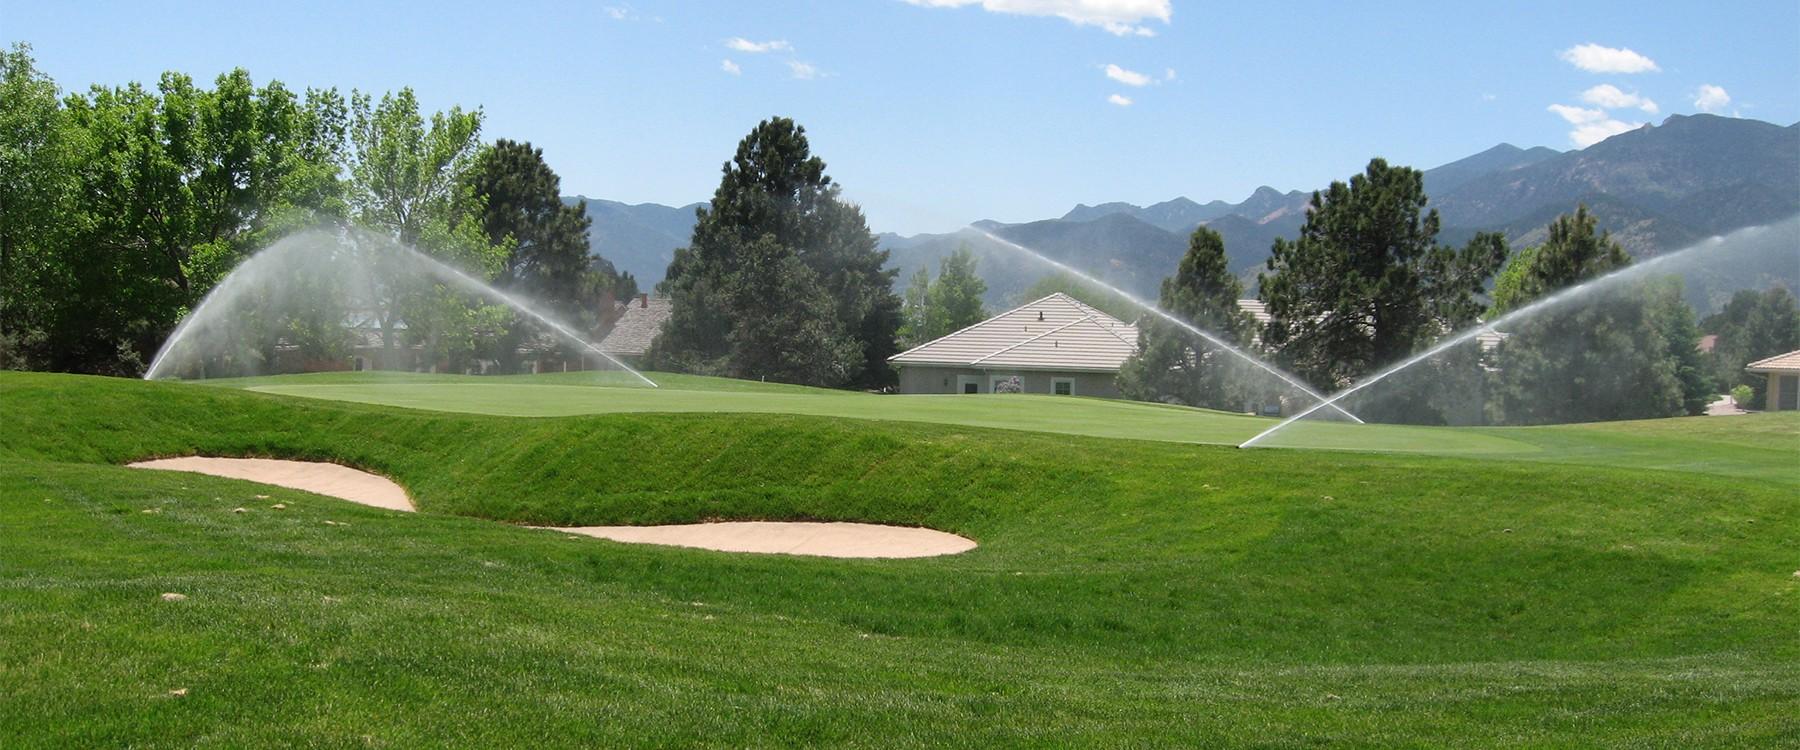 irrigation-technologies1